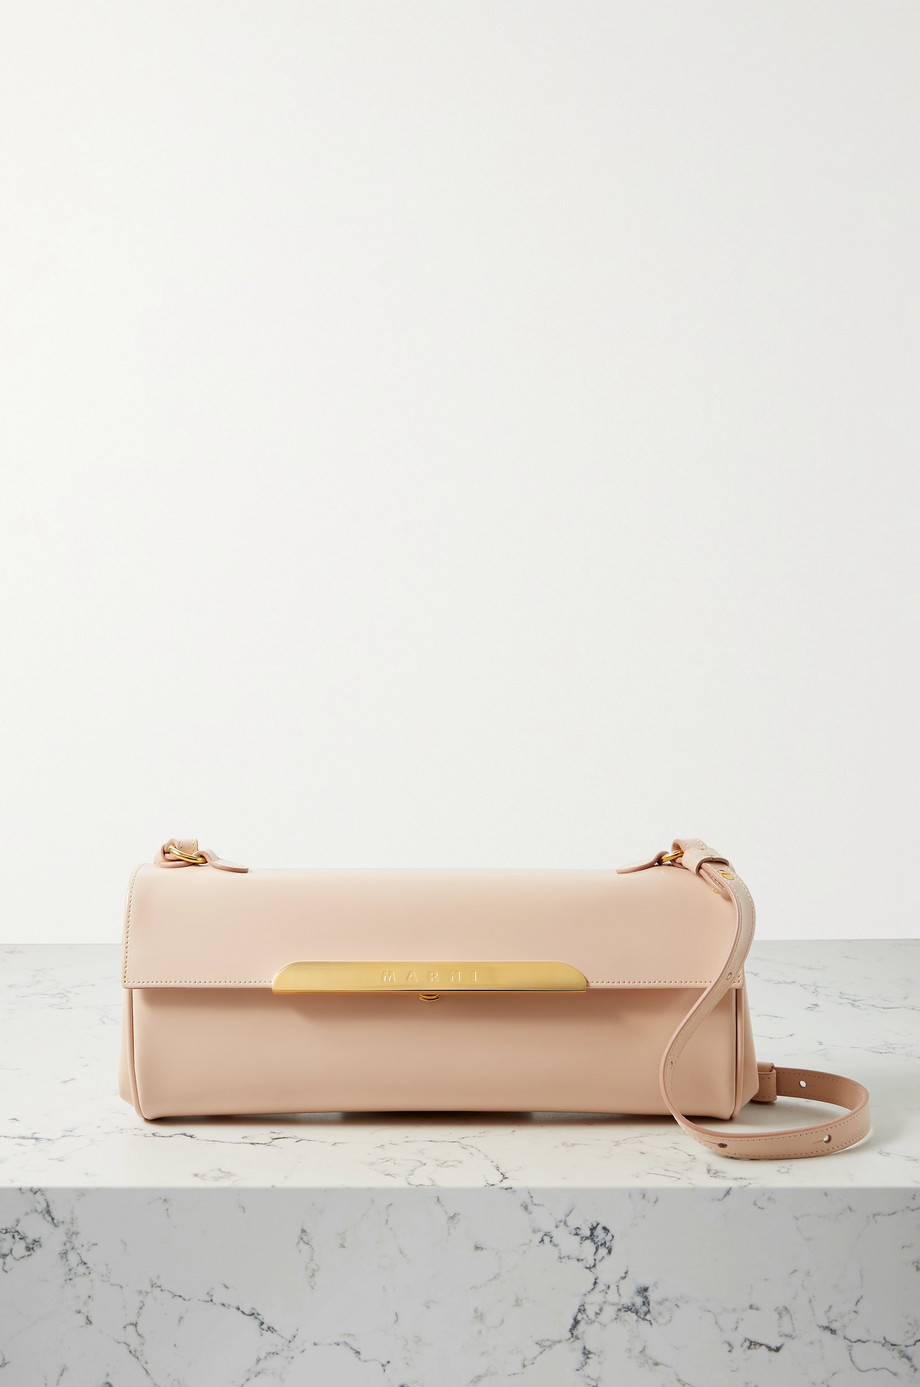 Marni Corinne medium leather shoulder bag